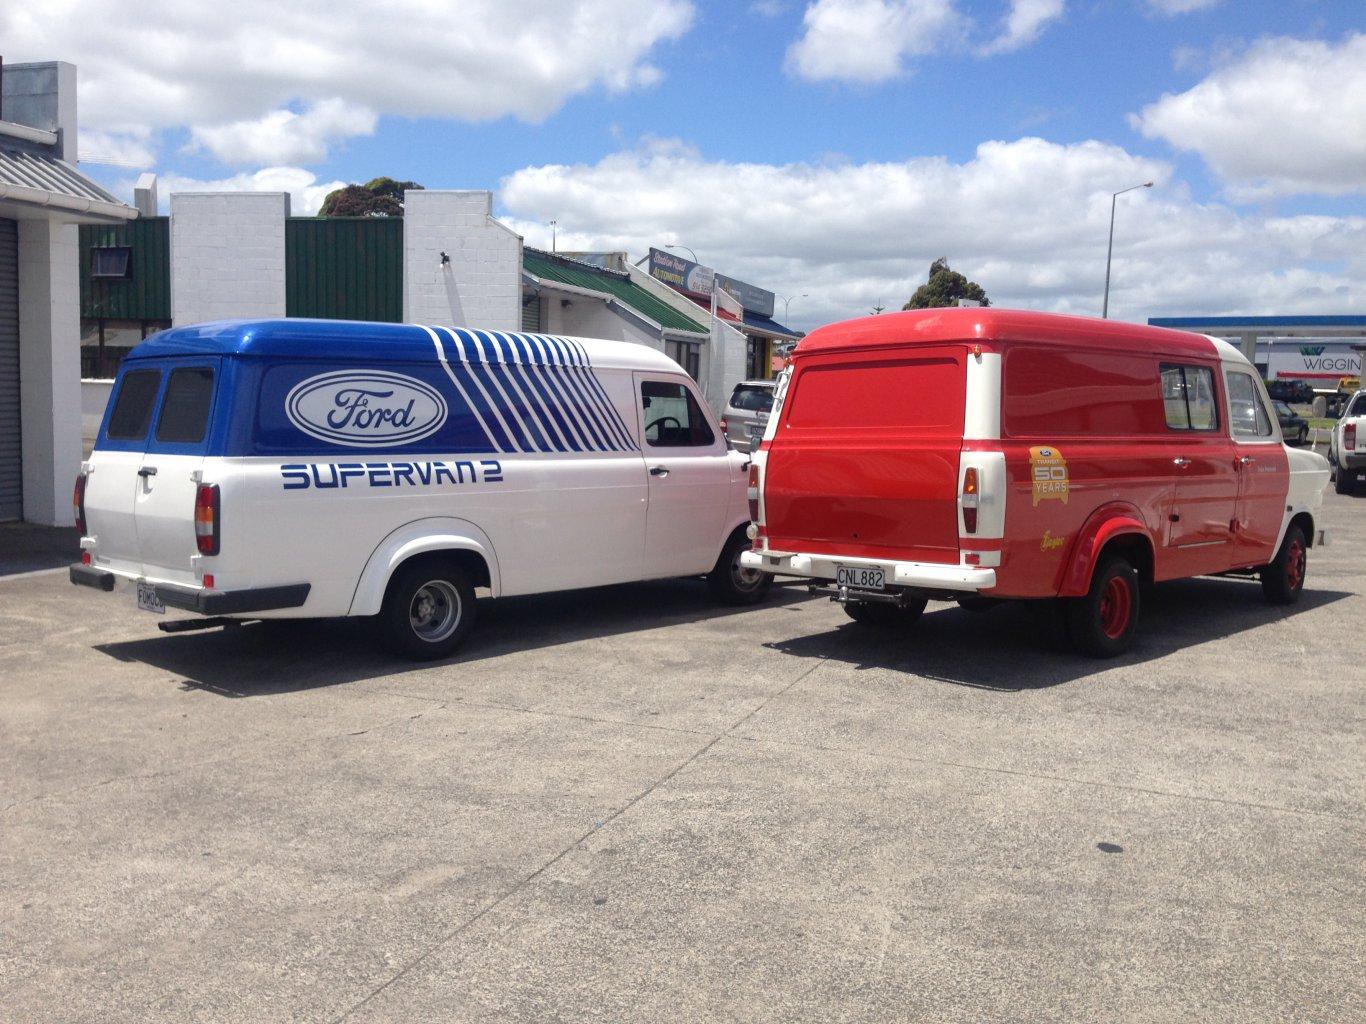 SV2 and firevan 003.jpg